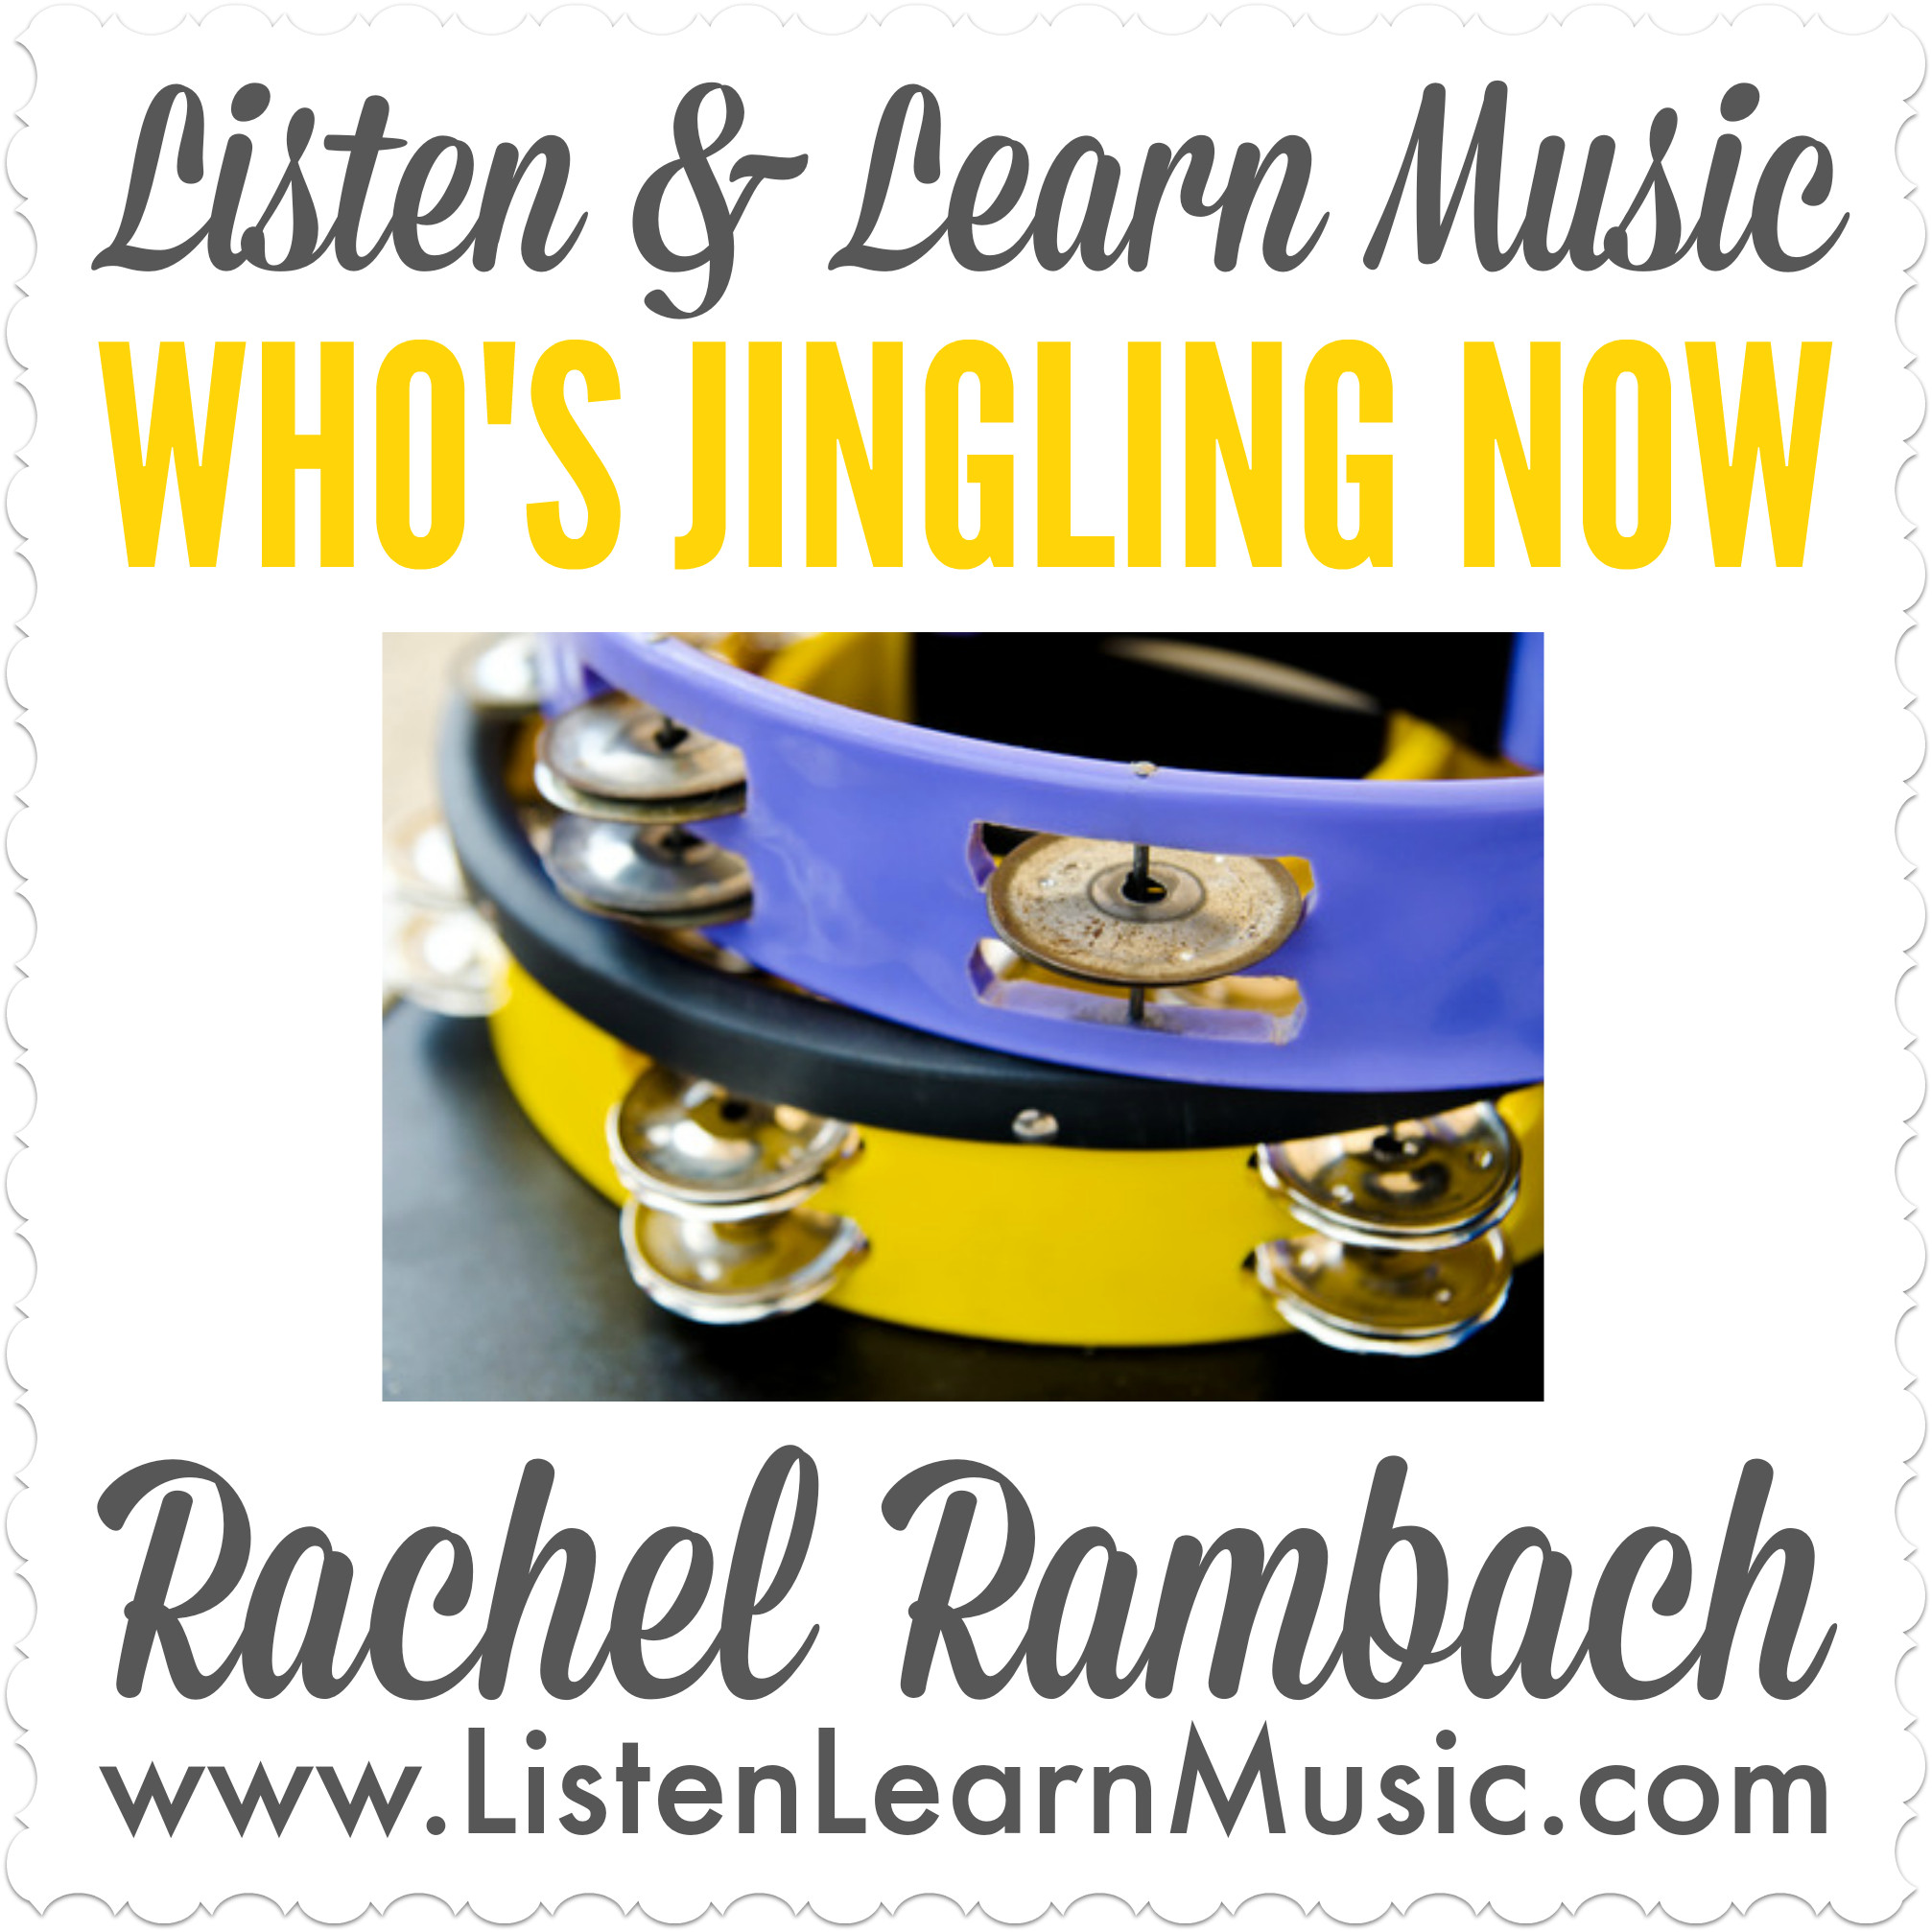 Who's Jingling Now | Listen & Learn Music